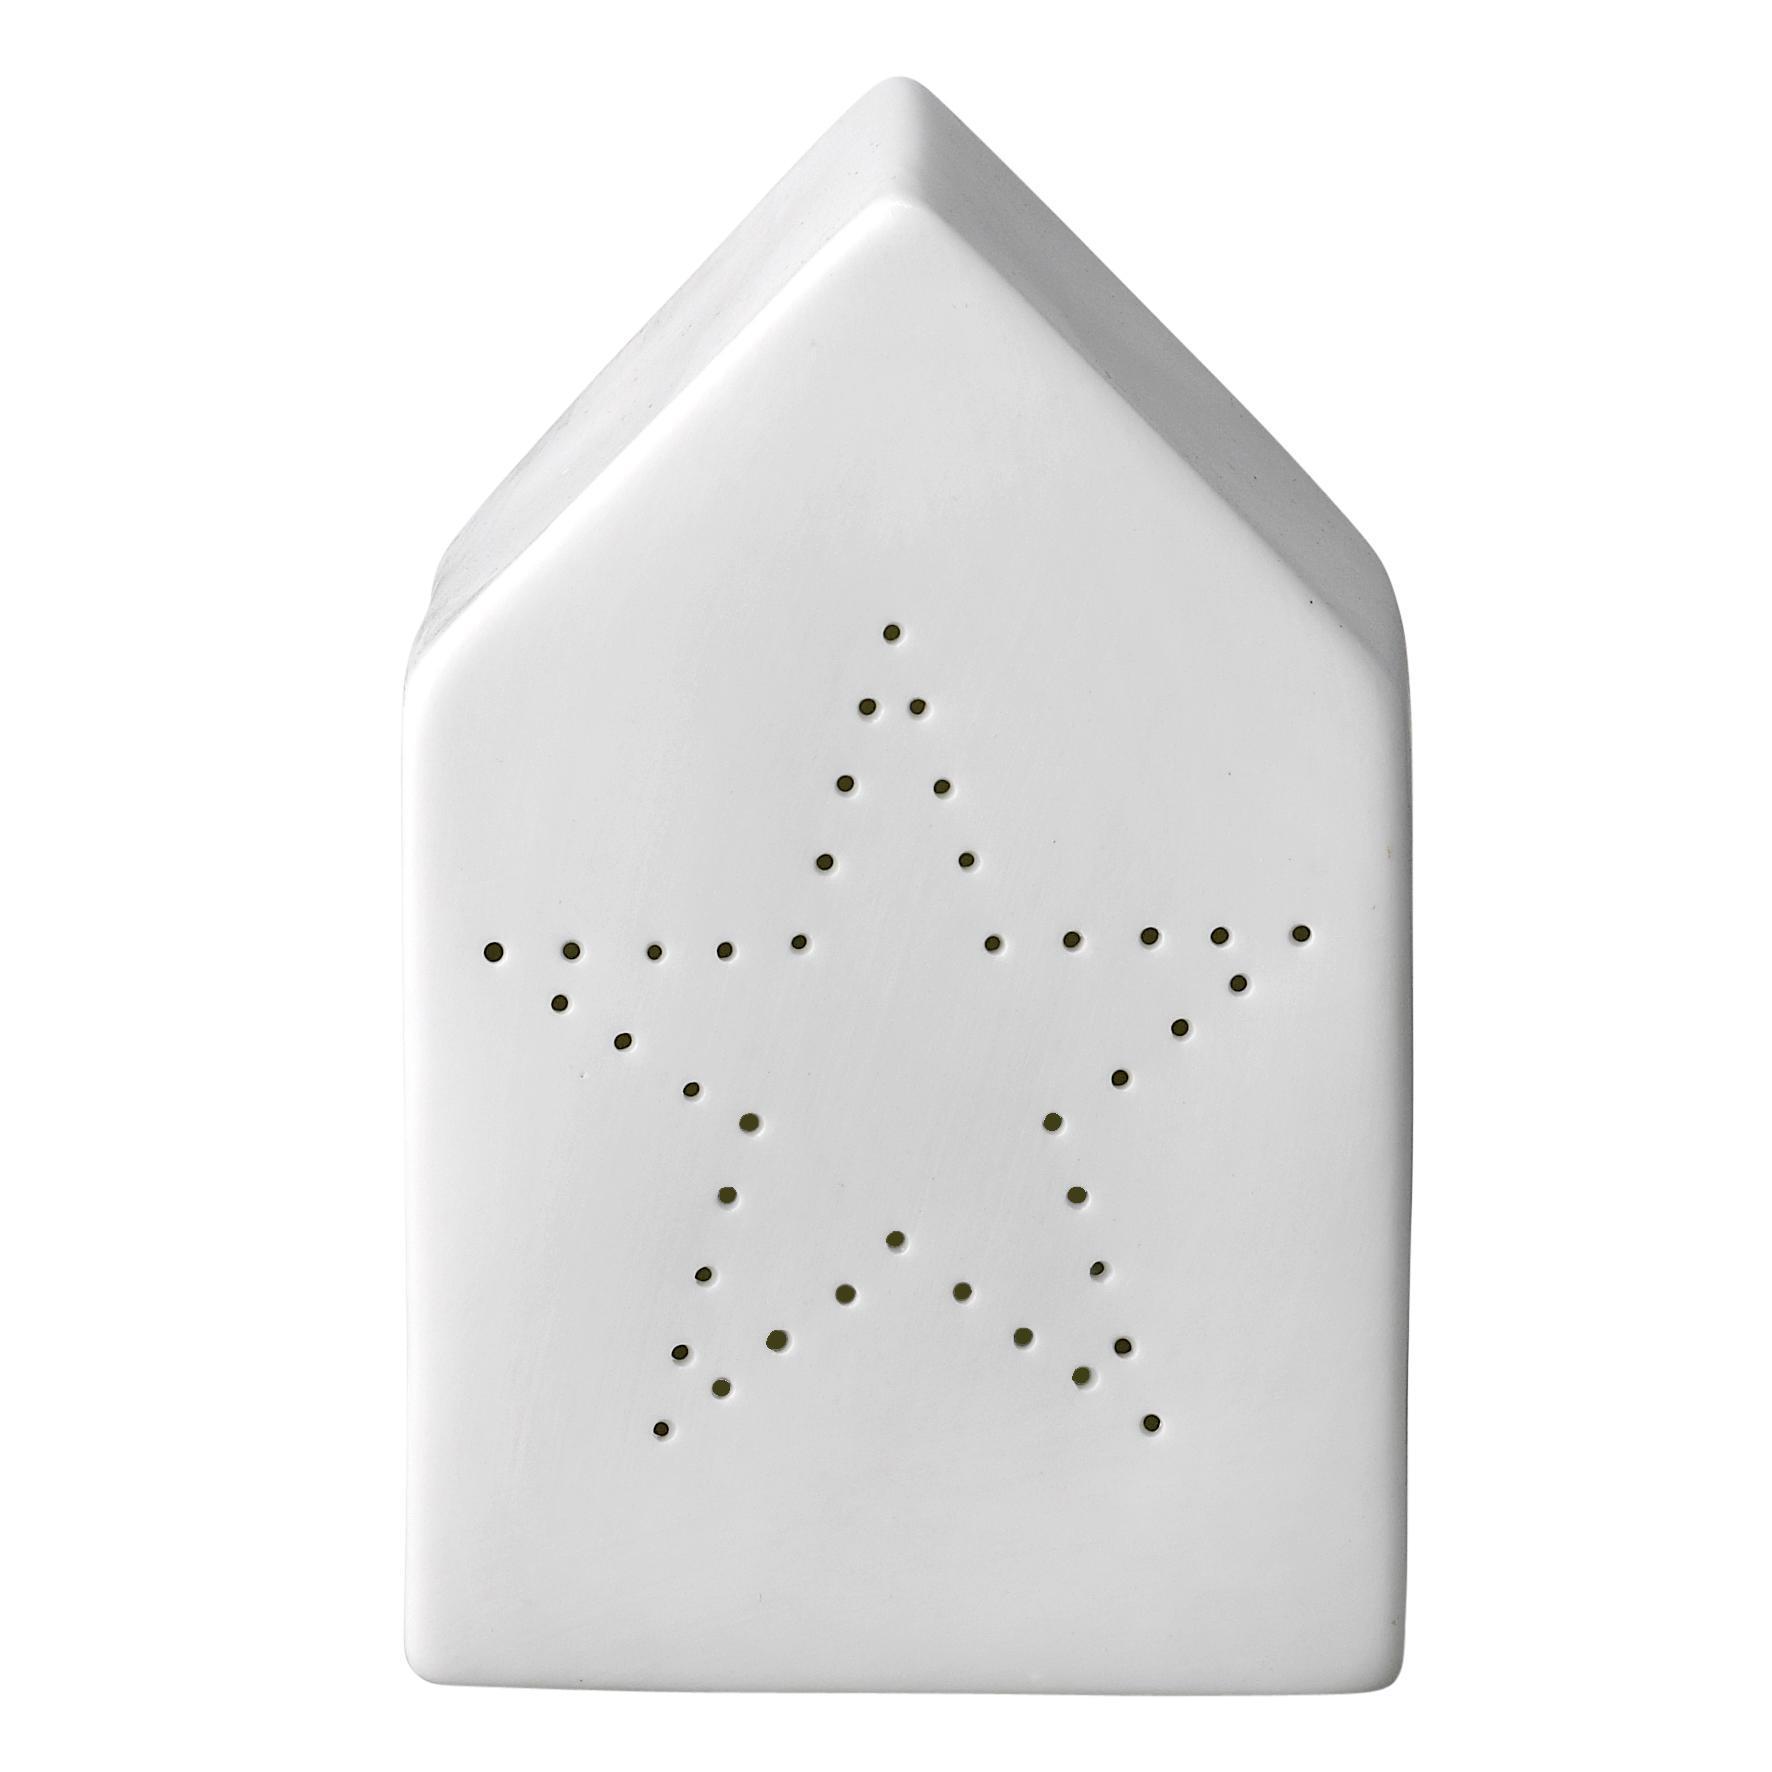 Bloomingville Porcelánová lucerna Star House, bílá barva, porcelán